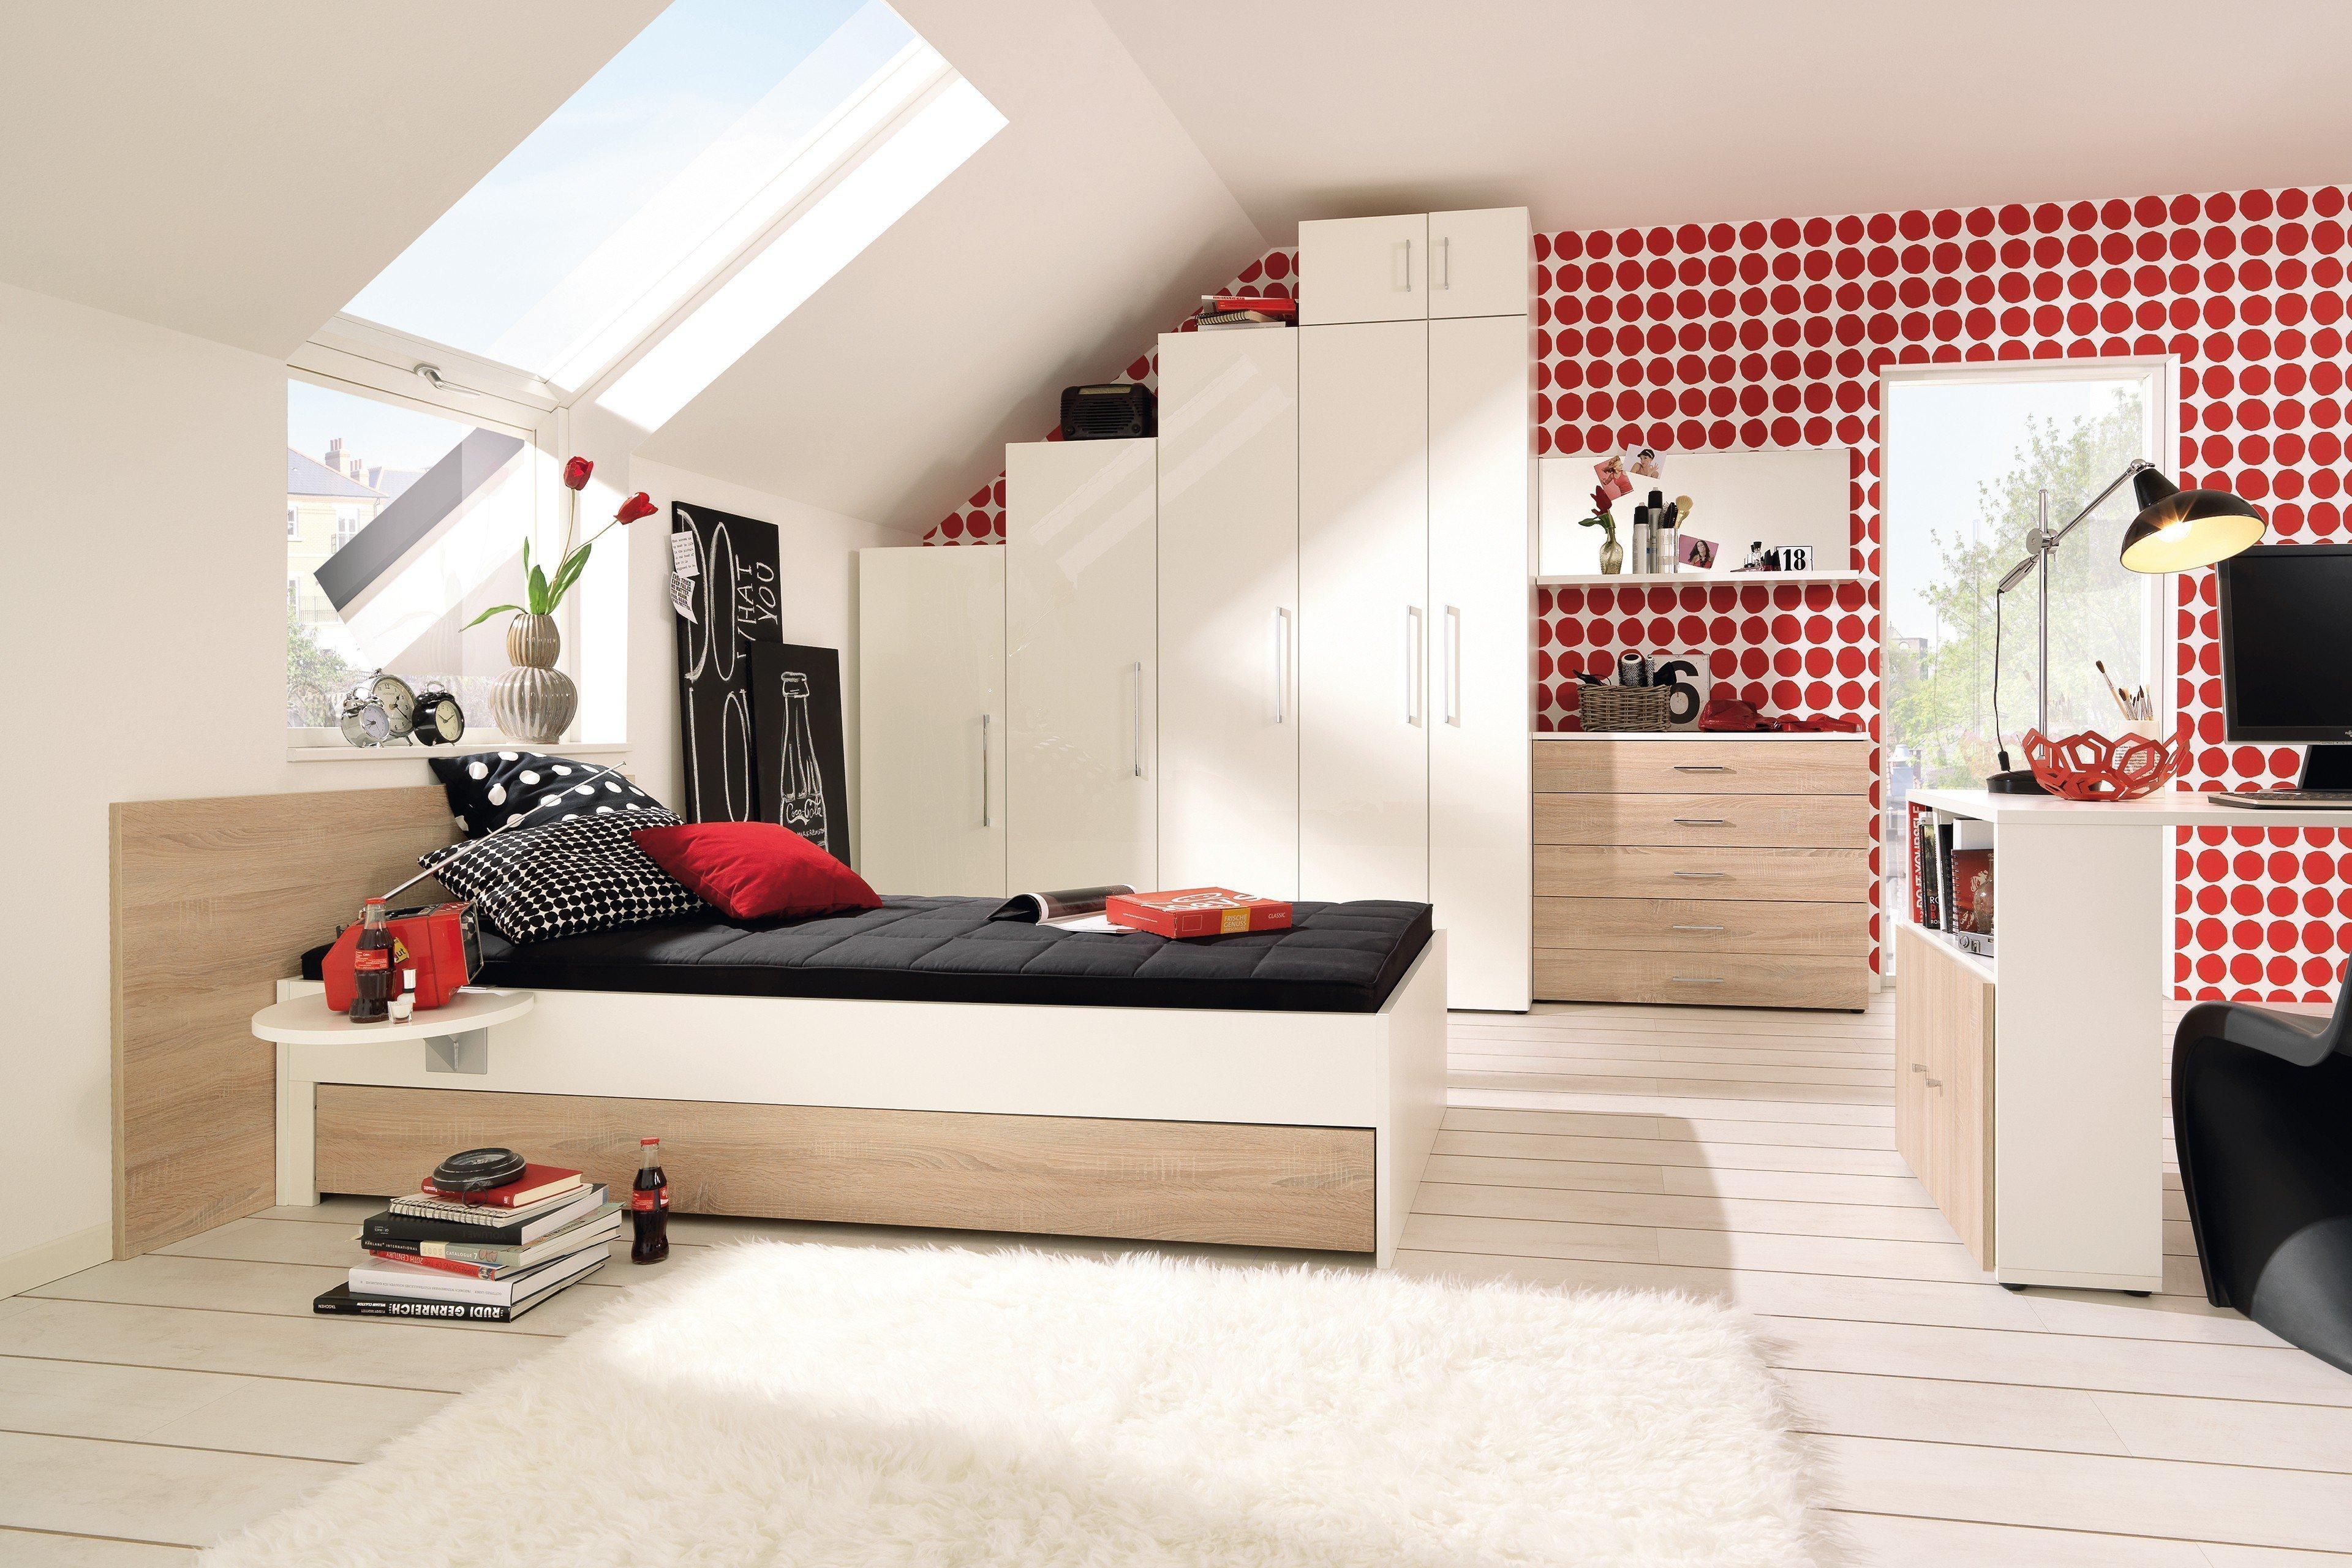 m bel wildeiche weiss interessante ideen. Black Bedroom Furniture Sets. Home Design Ideas